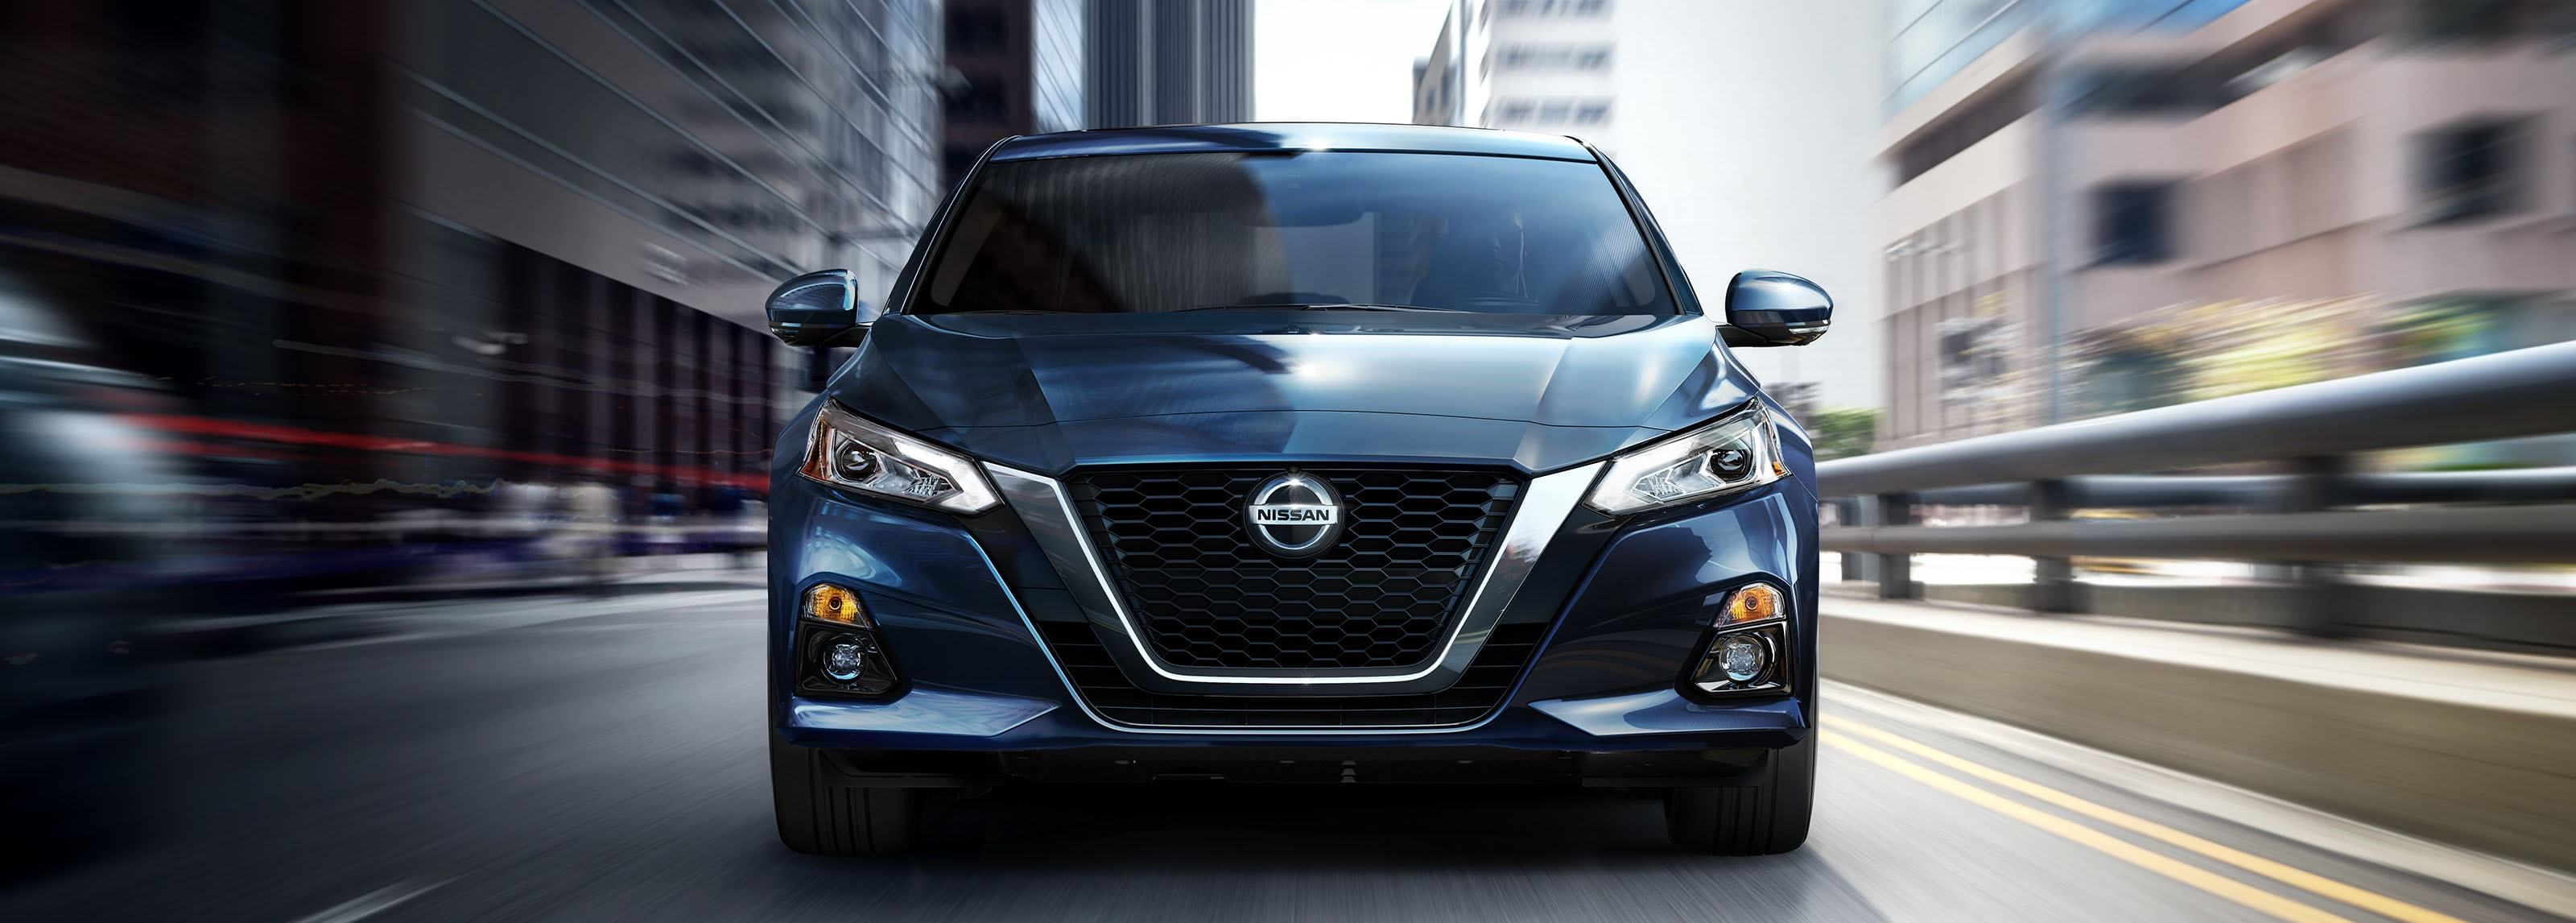 2020 Nissan Altima Trim Levels in Milford, MA